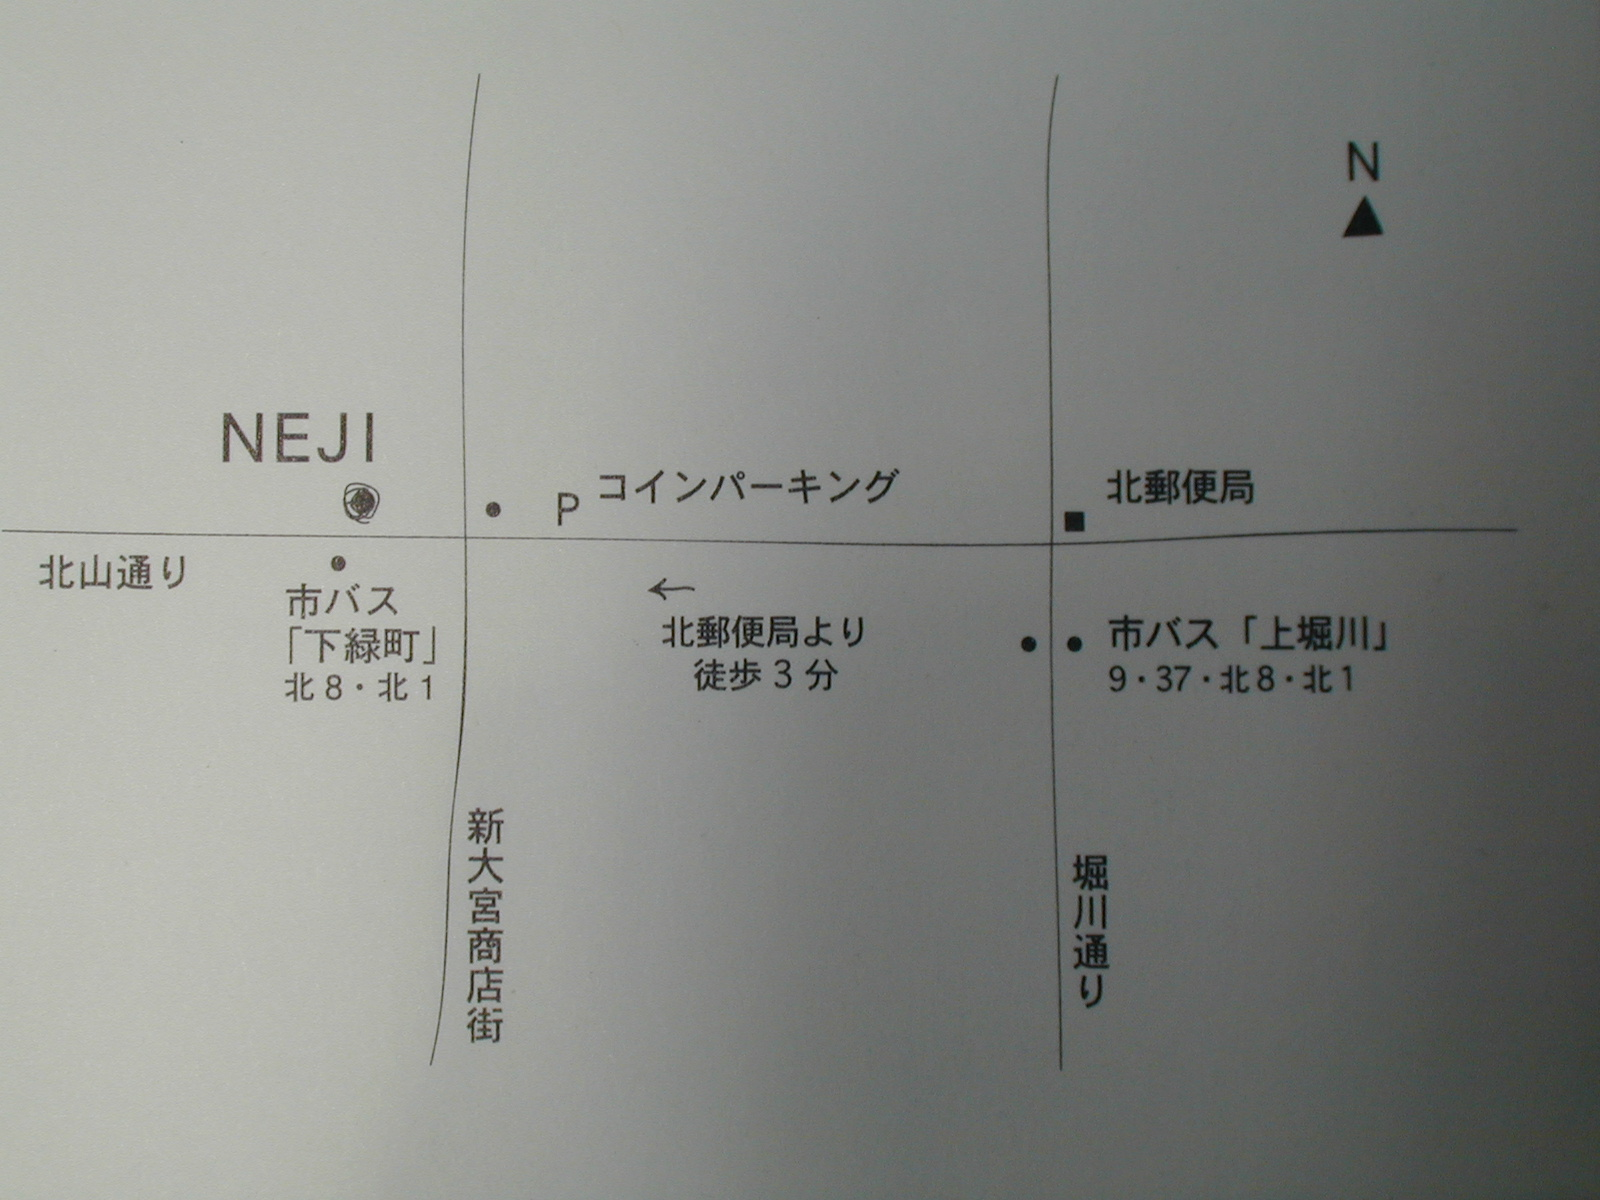 090512neji_006